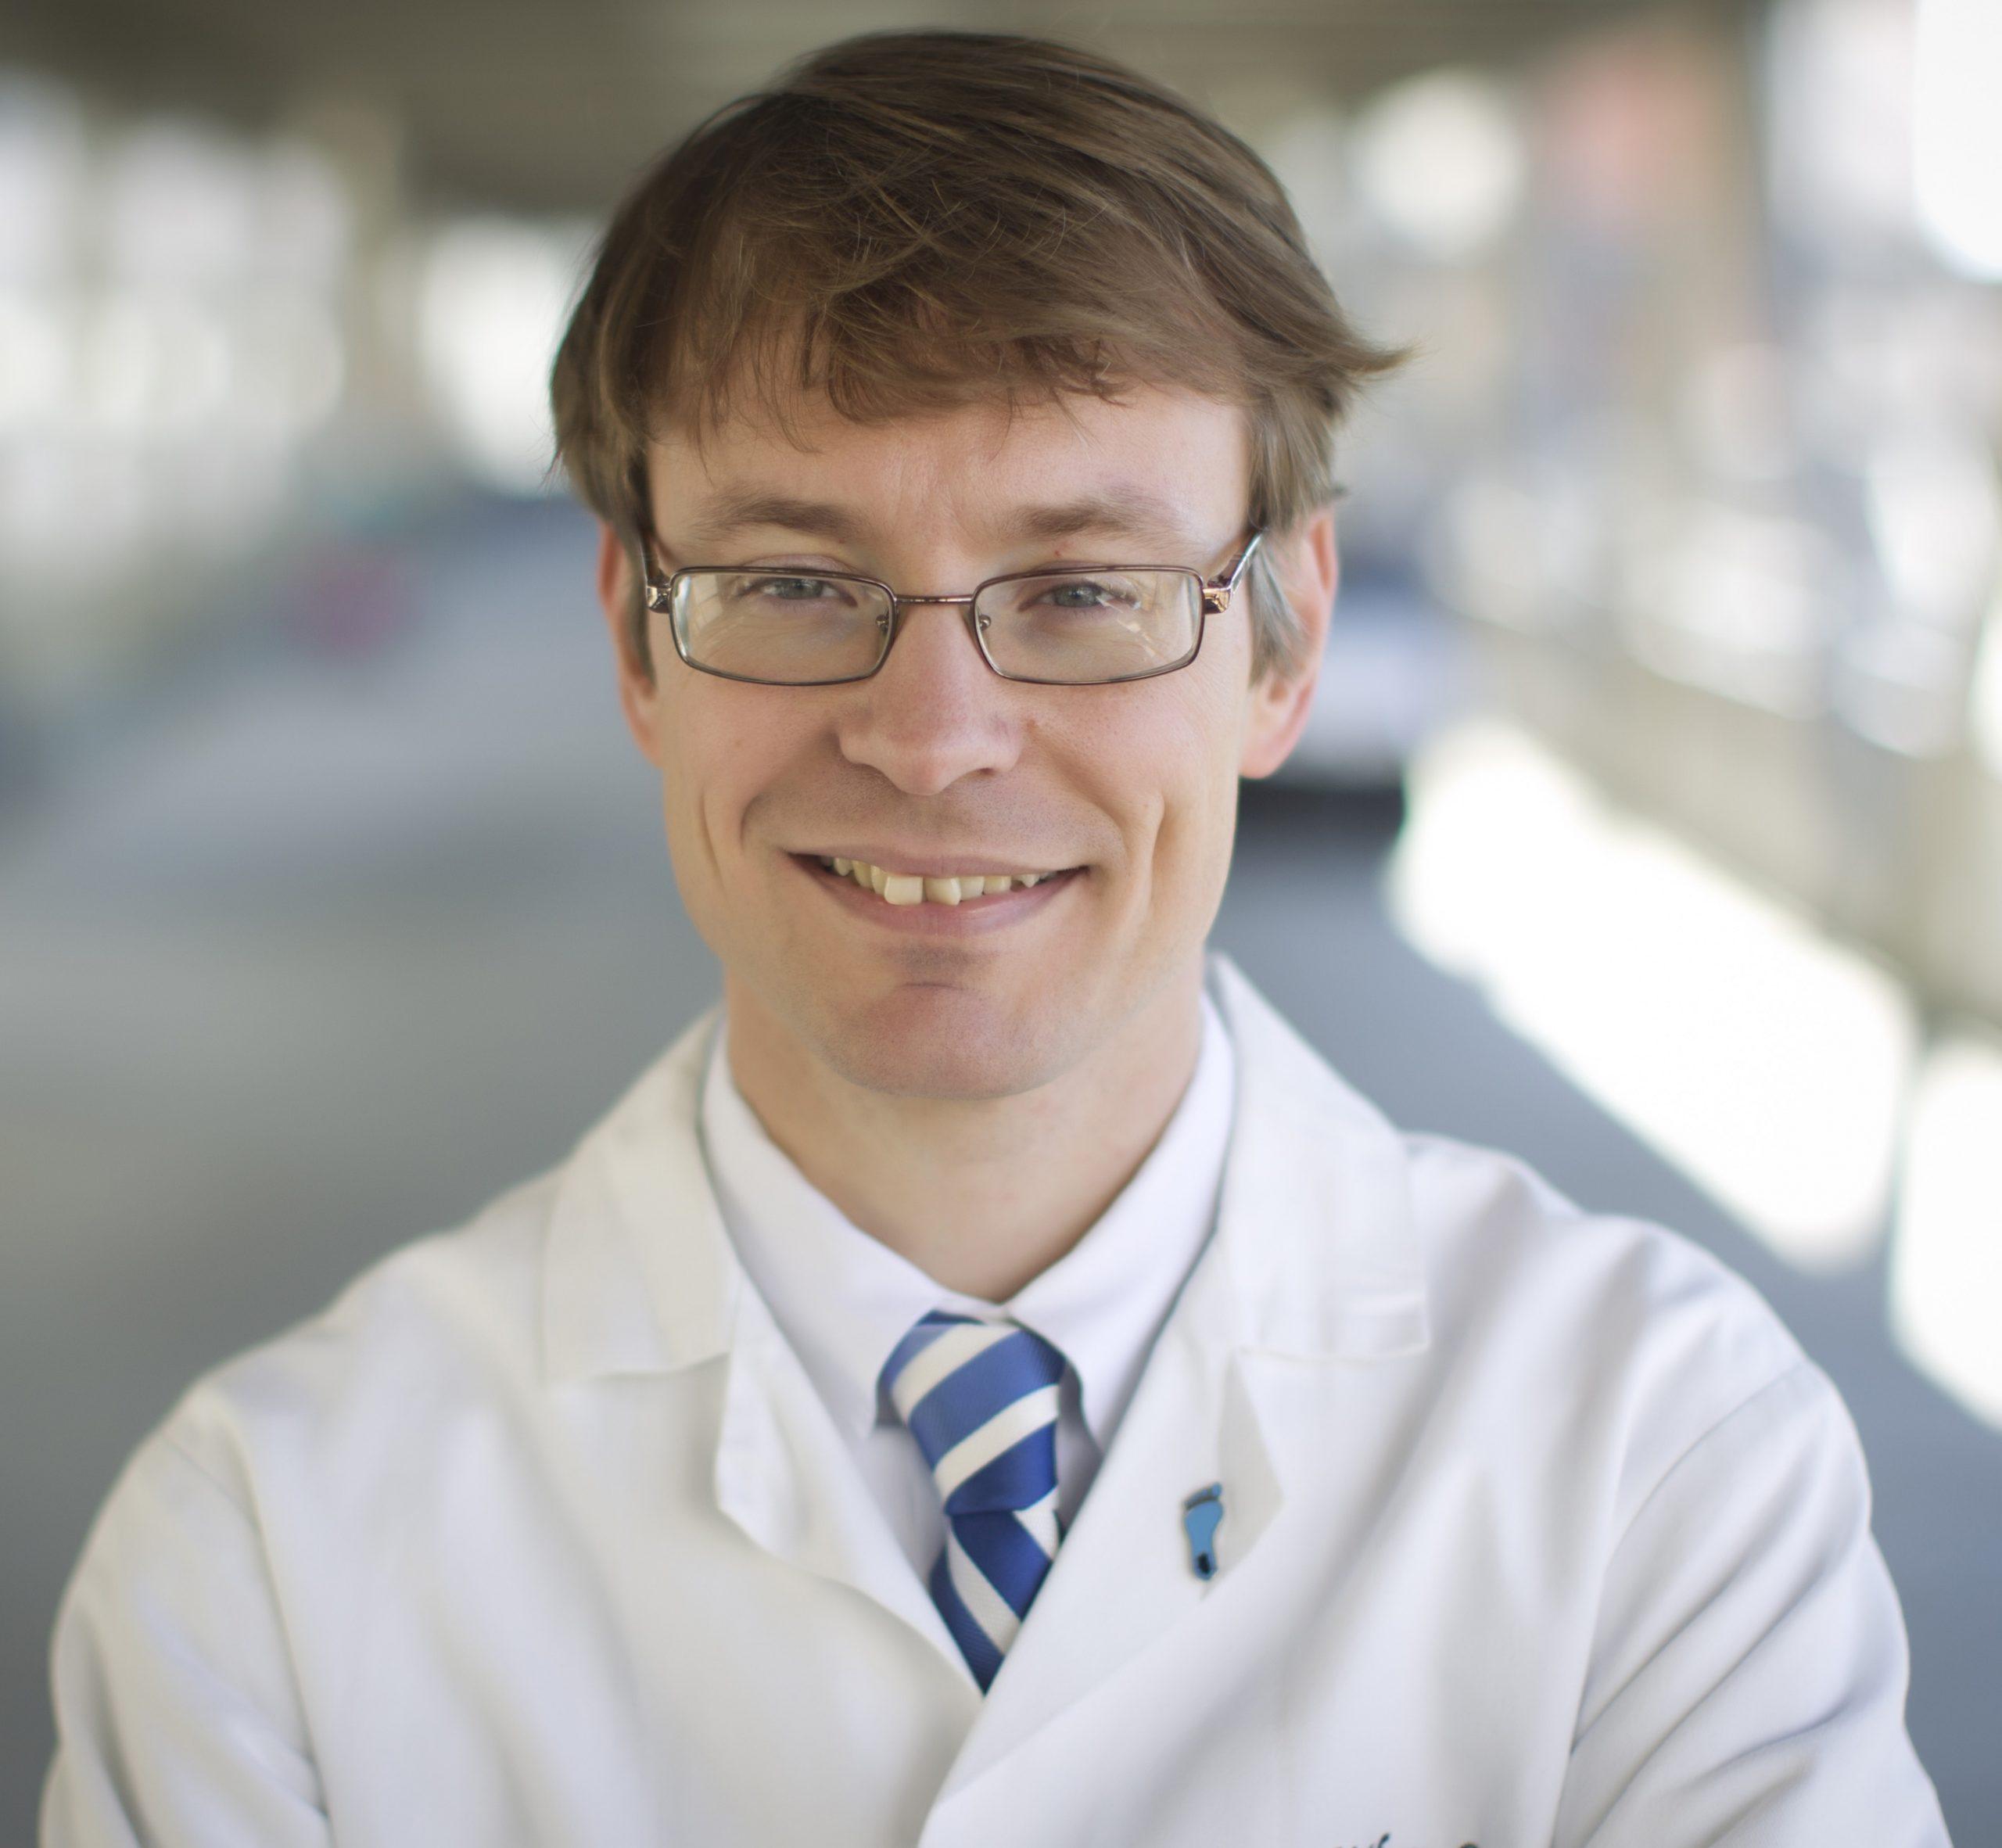 Mathew C. Raynor, MD, FACS